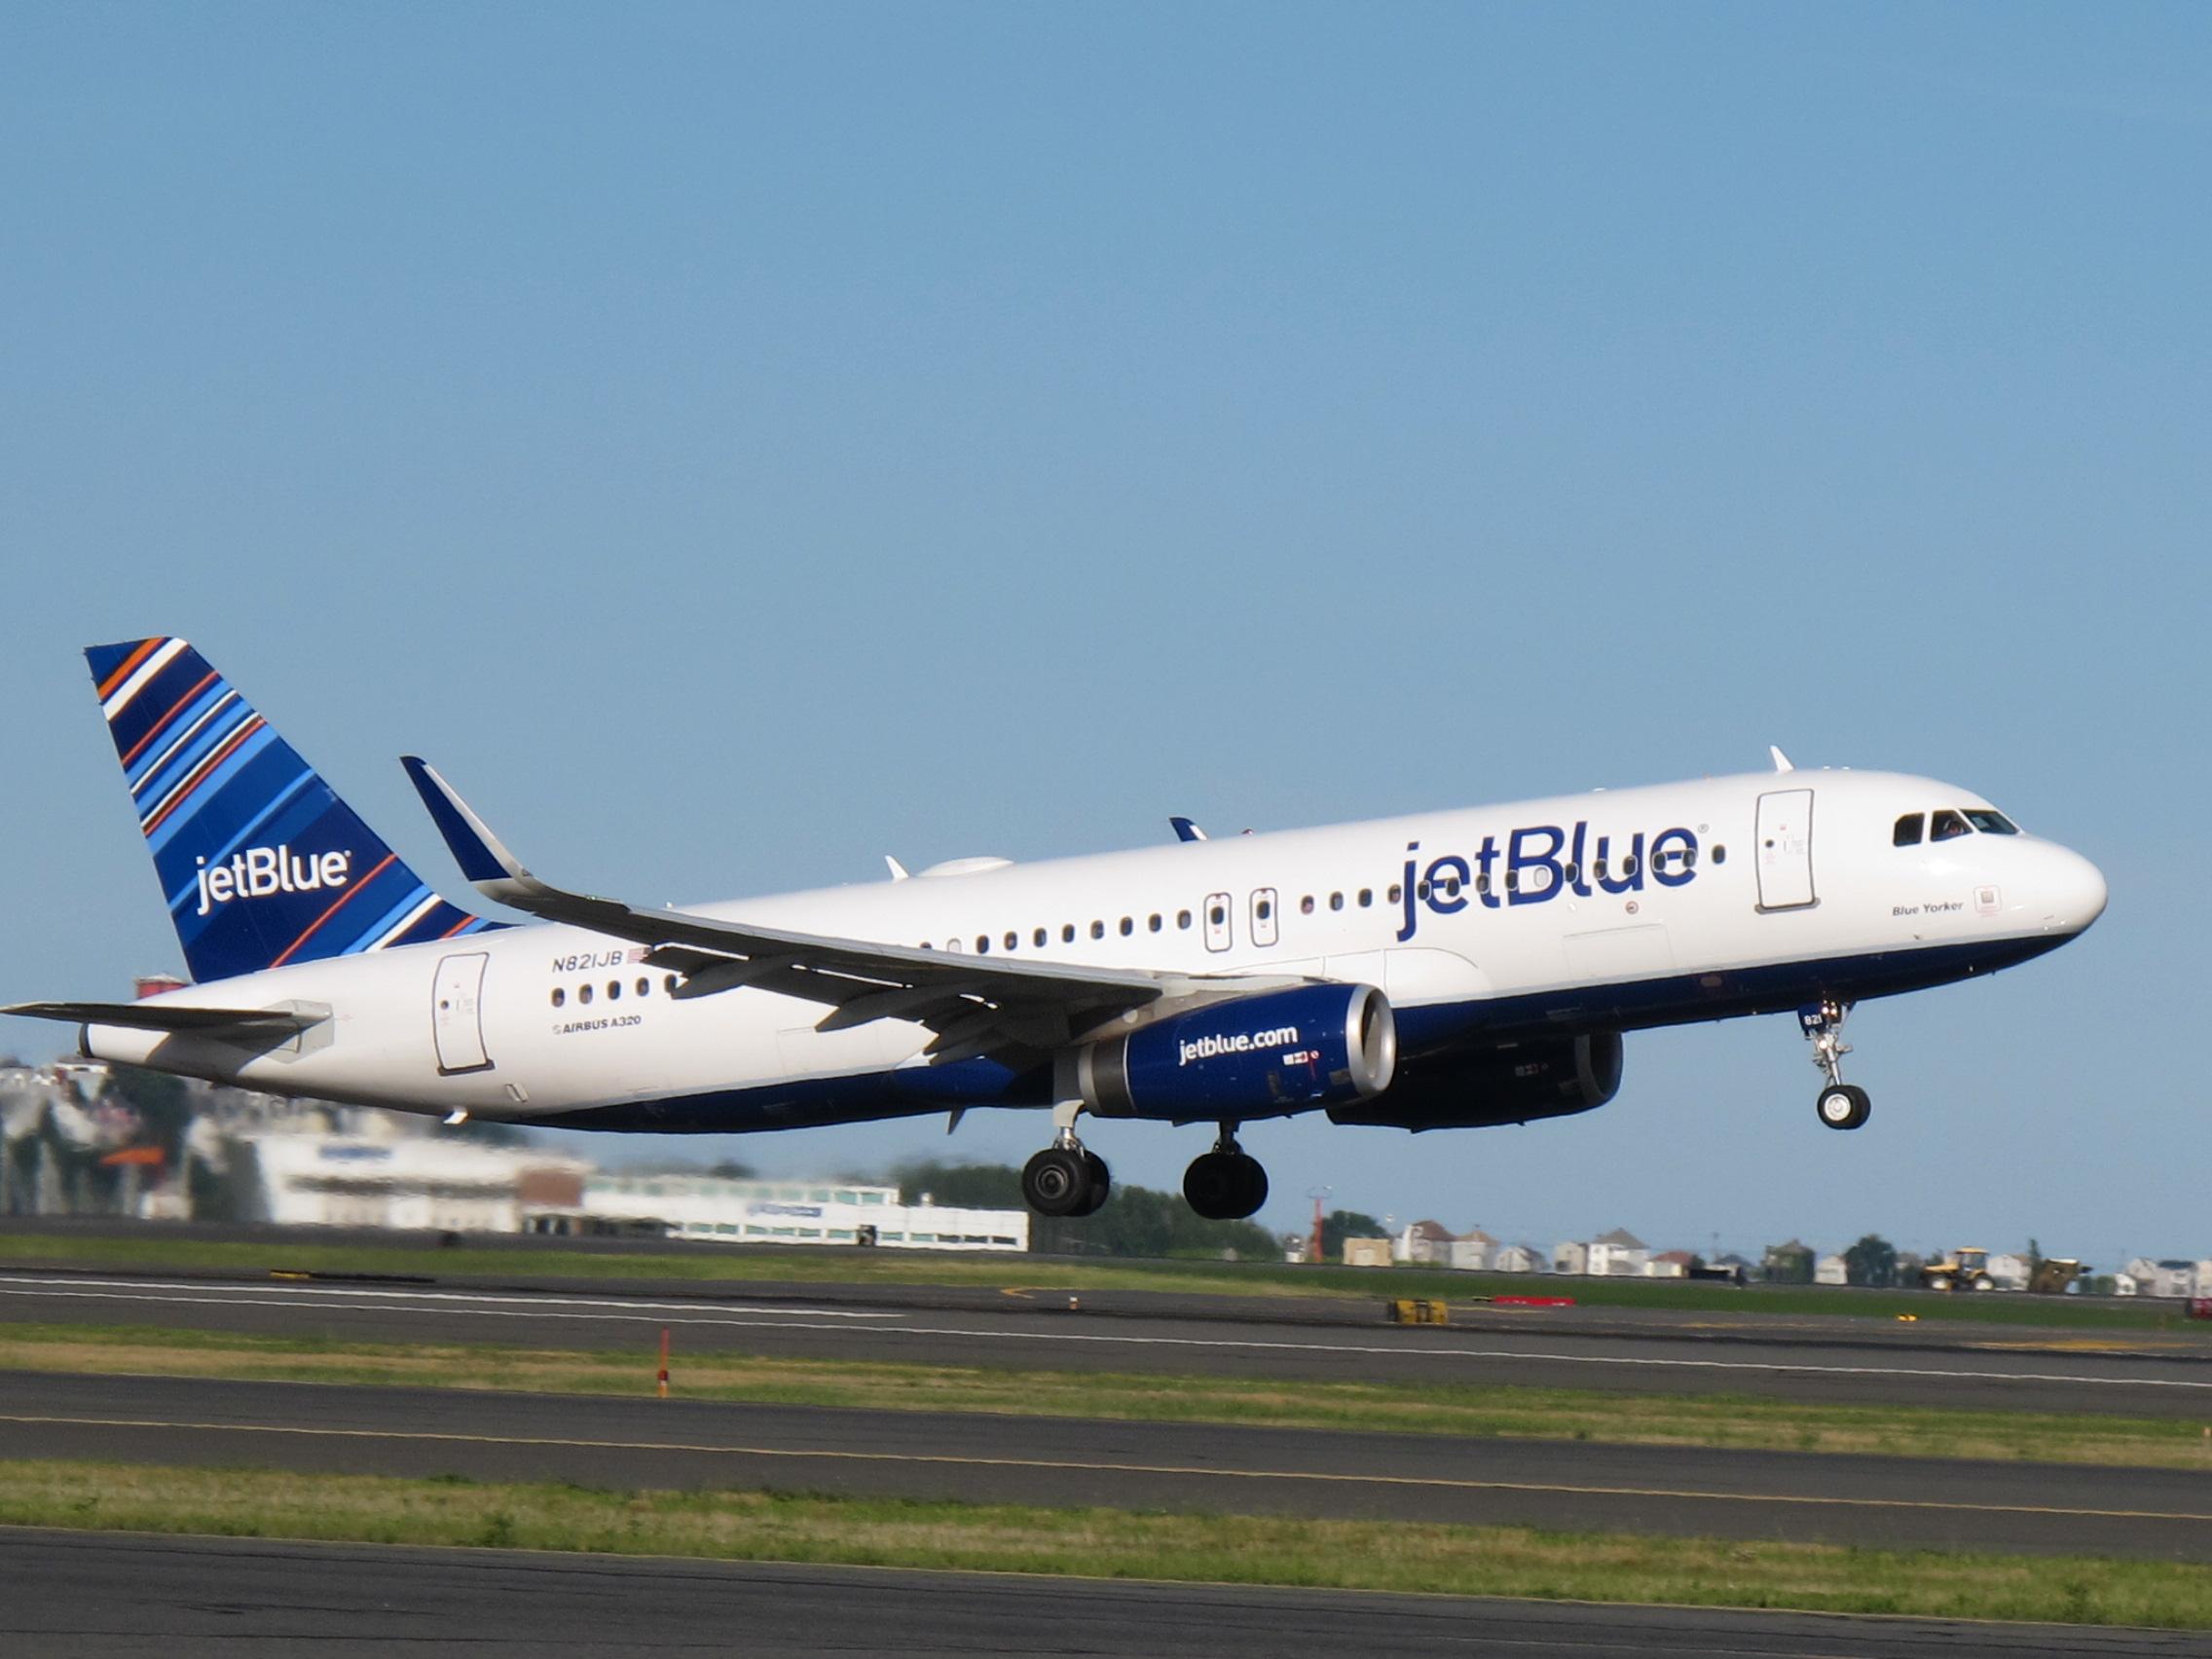 A JetBlue plane taking off.